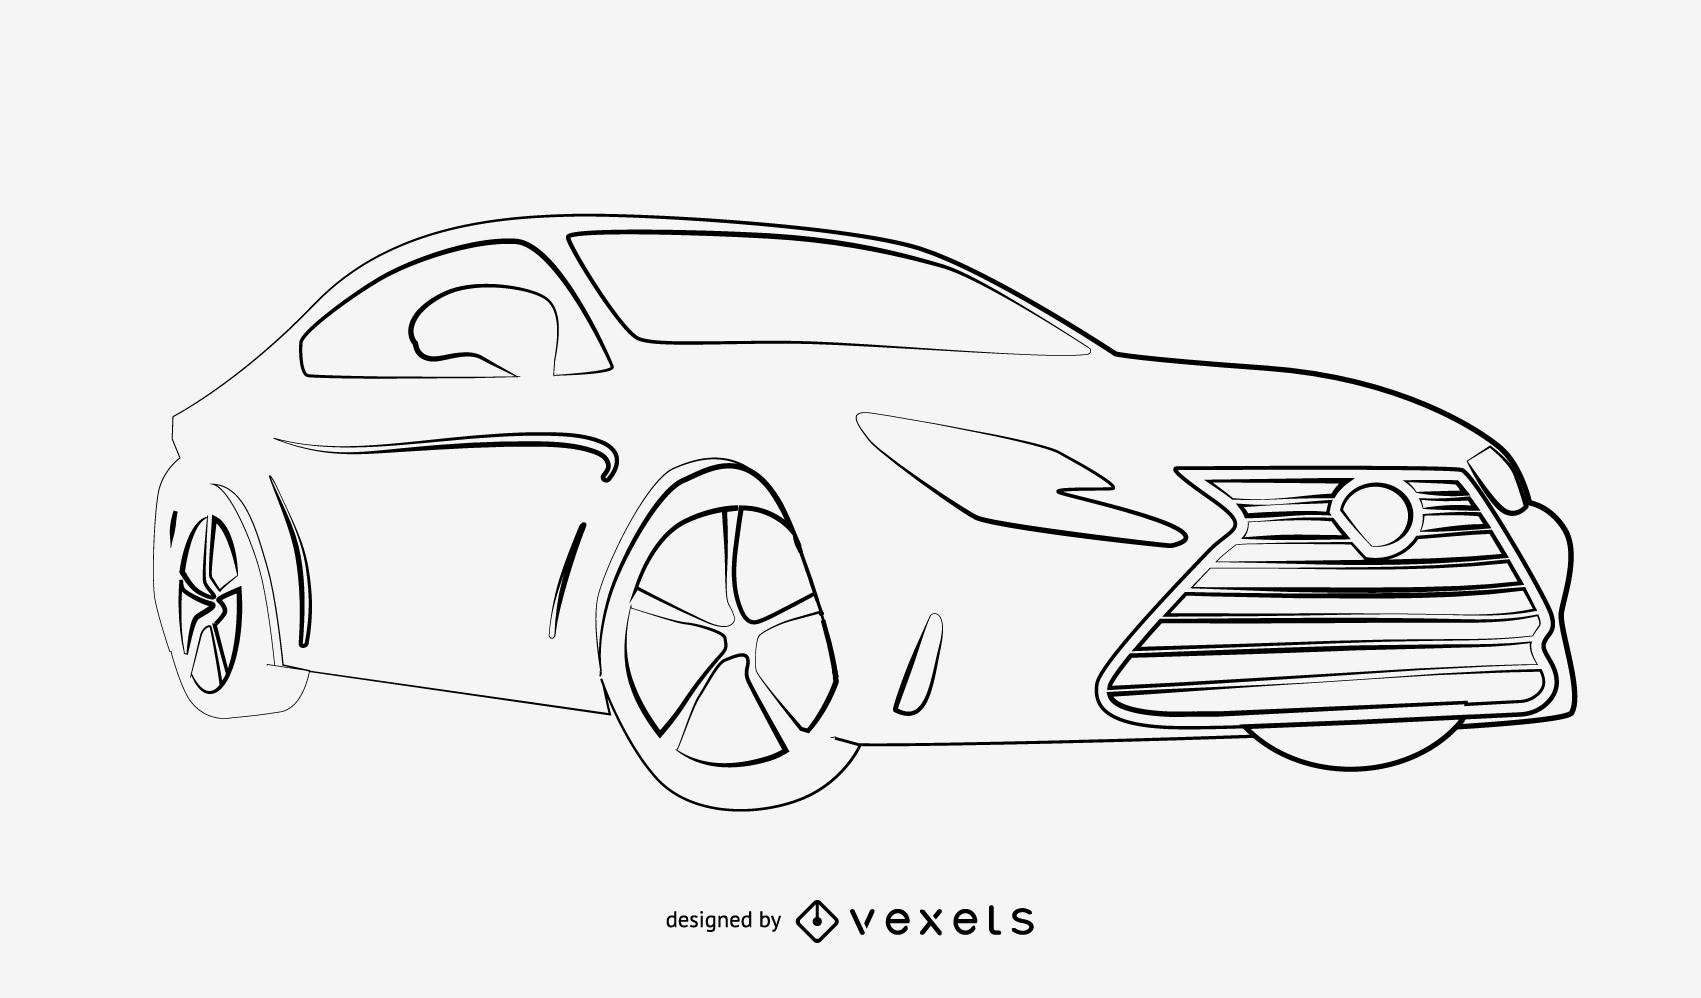 Sketchy Traced Mercedes-Benz SL